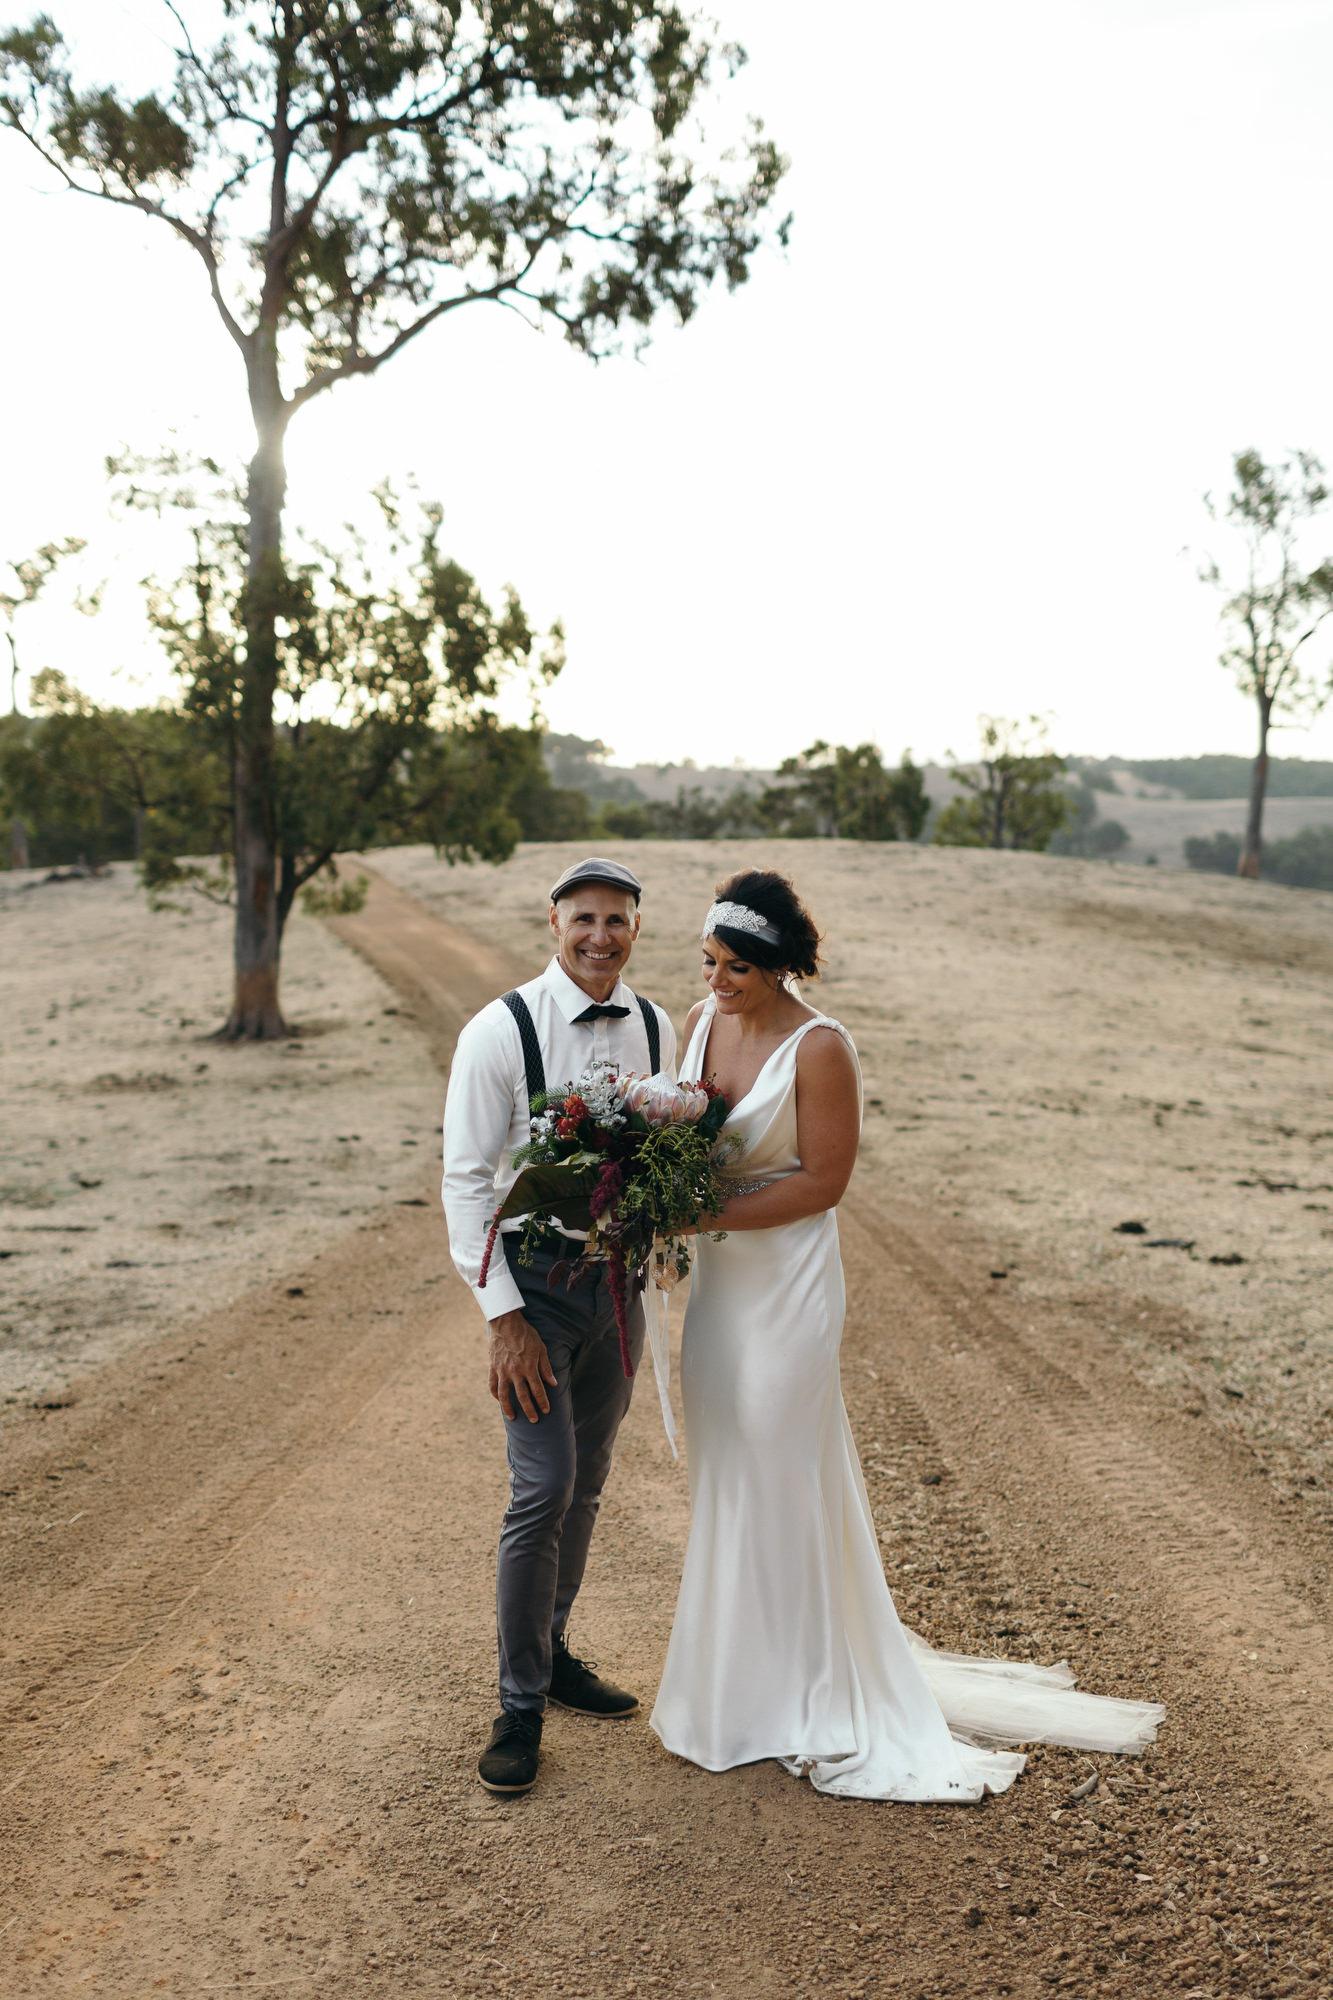 CLARK-WEDDING-EDITH-VALLEY-CARTER-ROSE-PHOTOGRAPHY-465.JPG